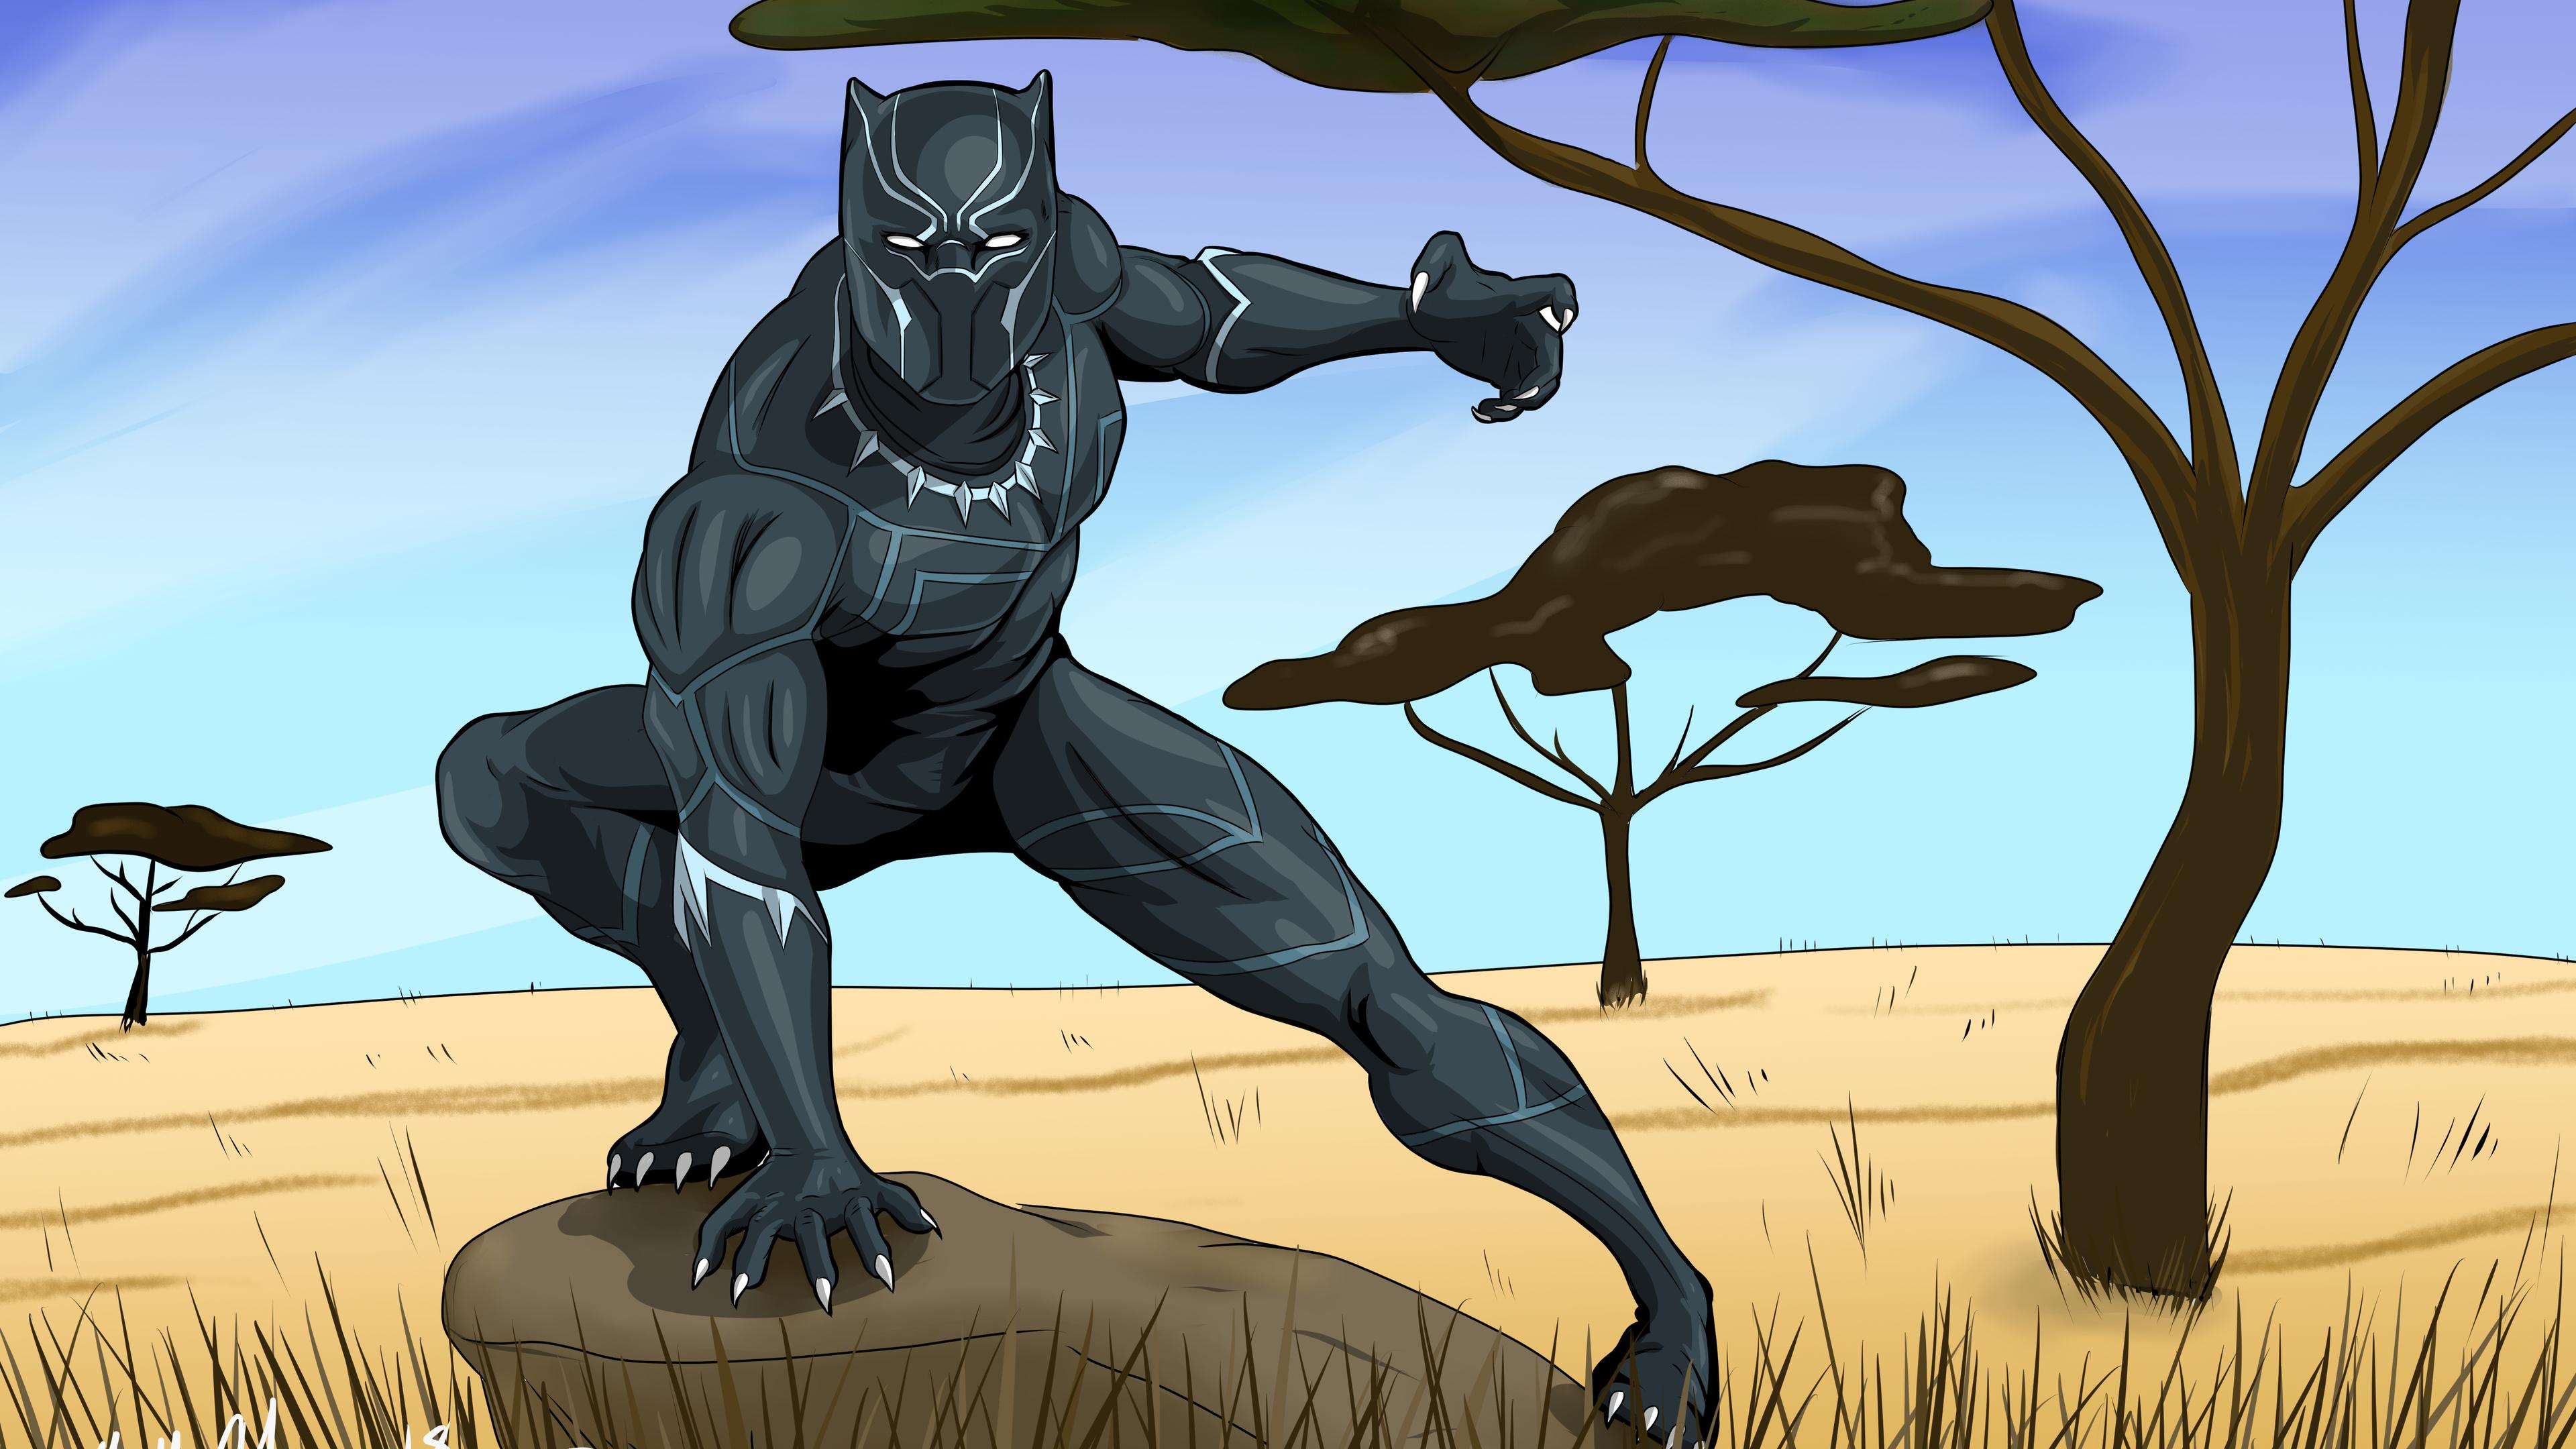 black panther 5k new artwork 1543620149 - Black Panther 5K New Artwork - superheroes wallpapers, hd-wallpapers, deviantart wallpapers, black panther wallpapers, artwork wallpapers, 4k-wallpapers